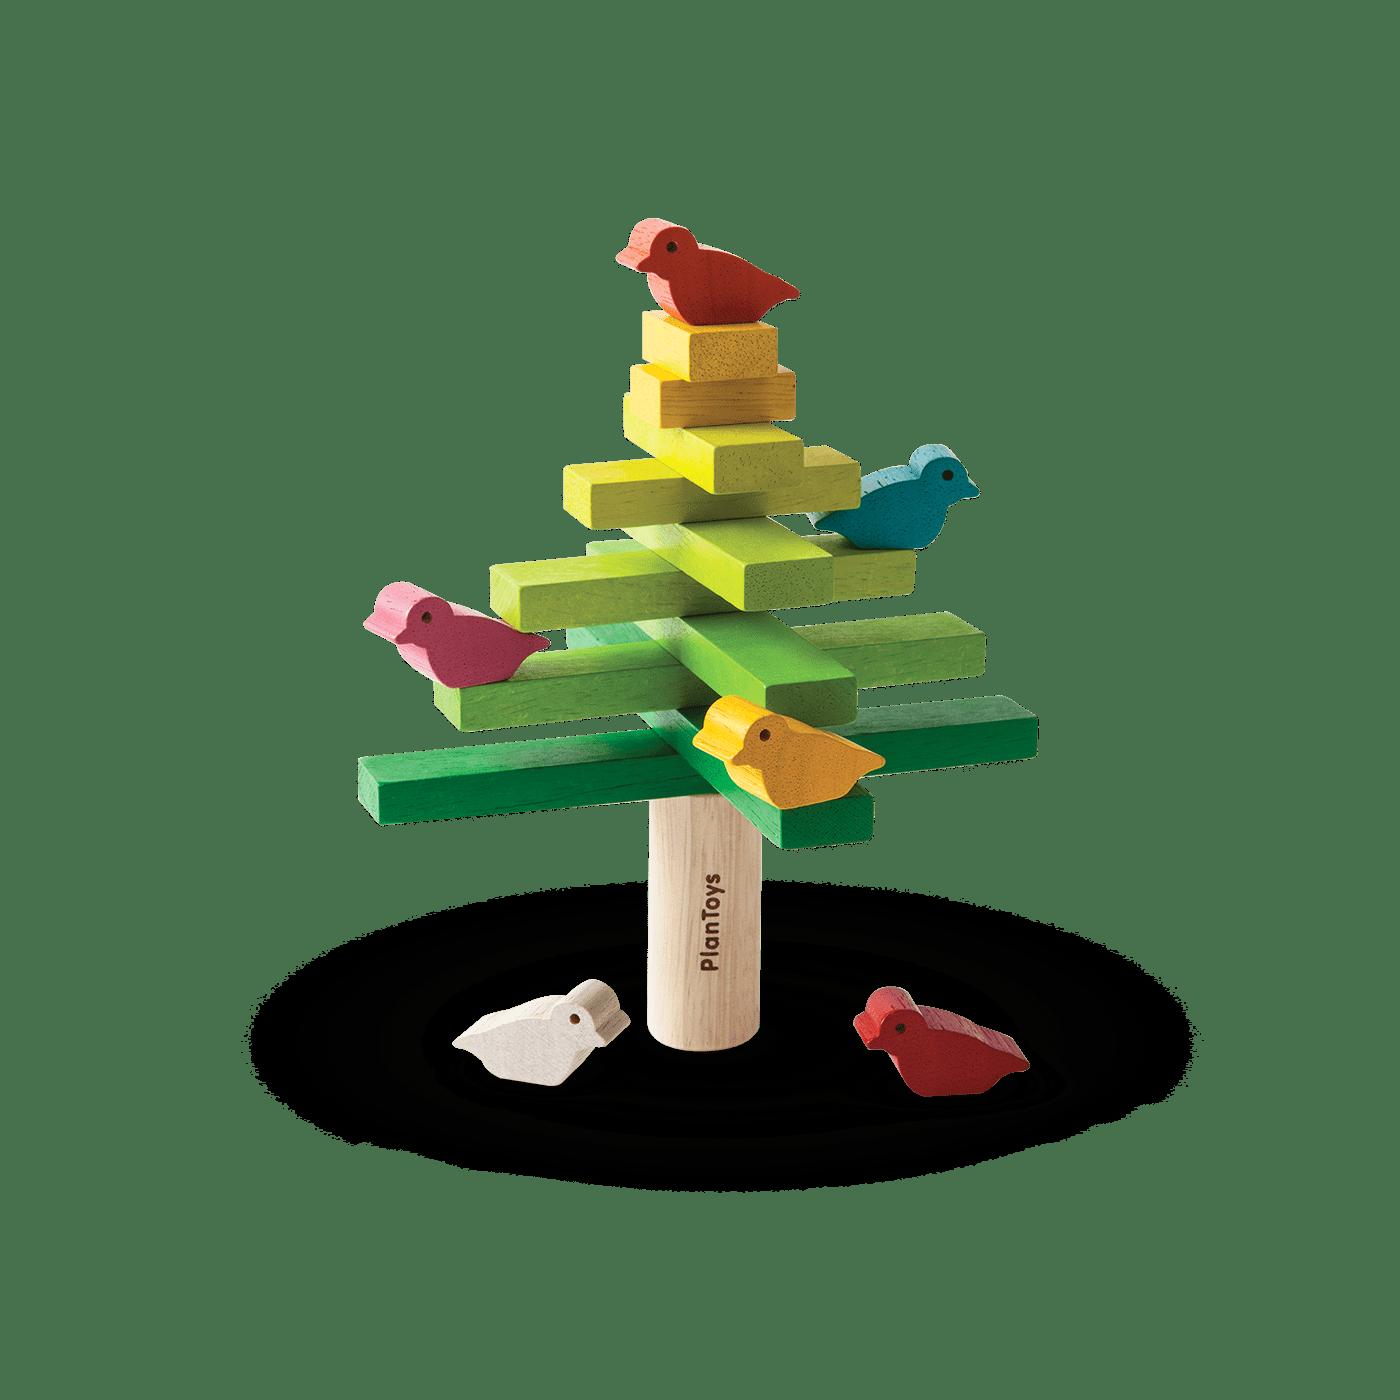 PlanToys - Balancierspiel Baum